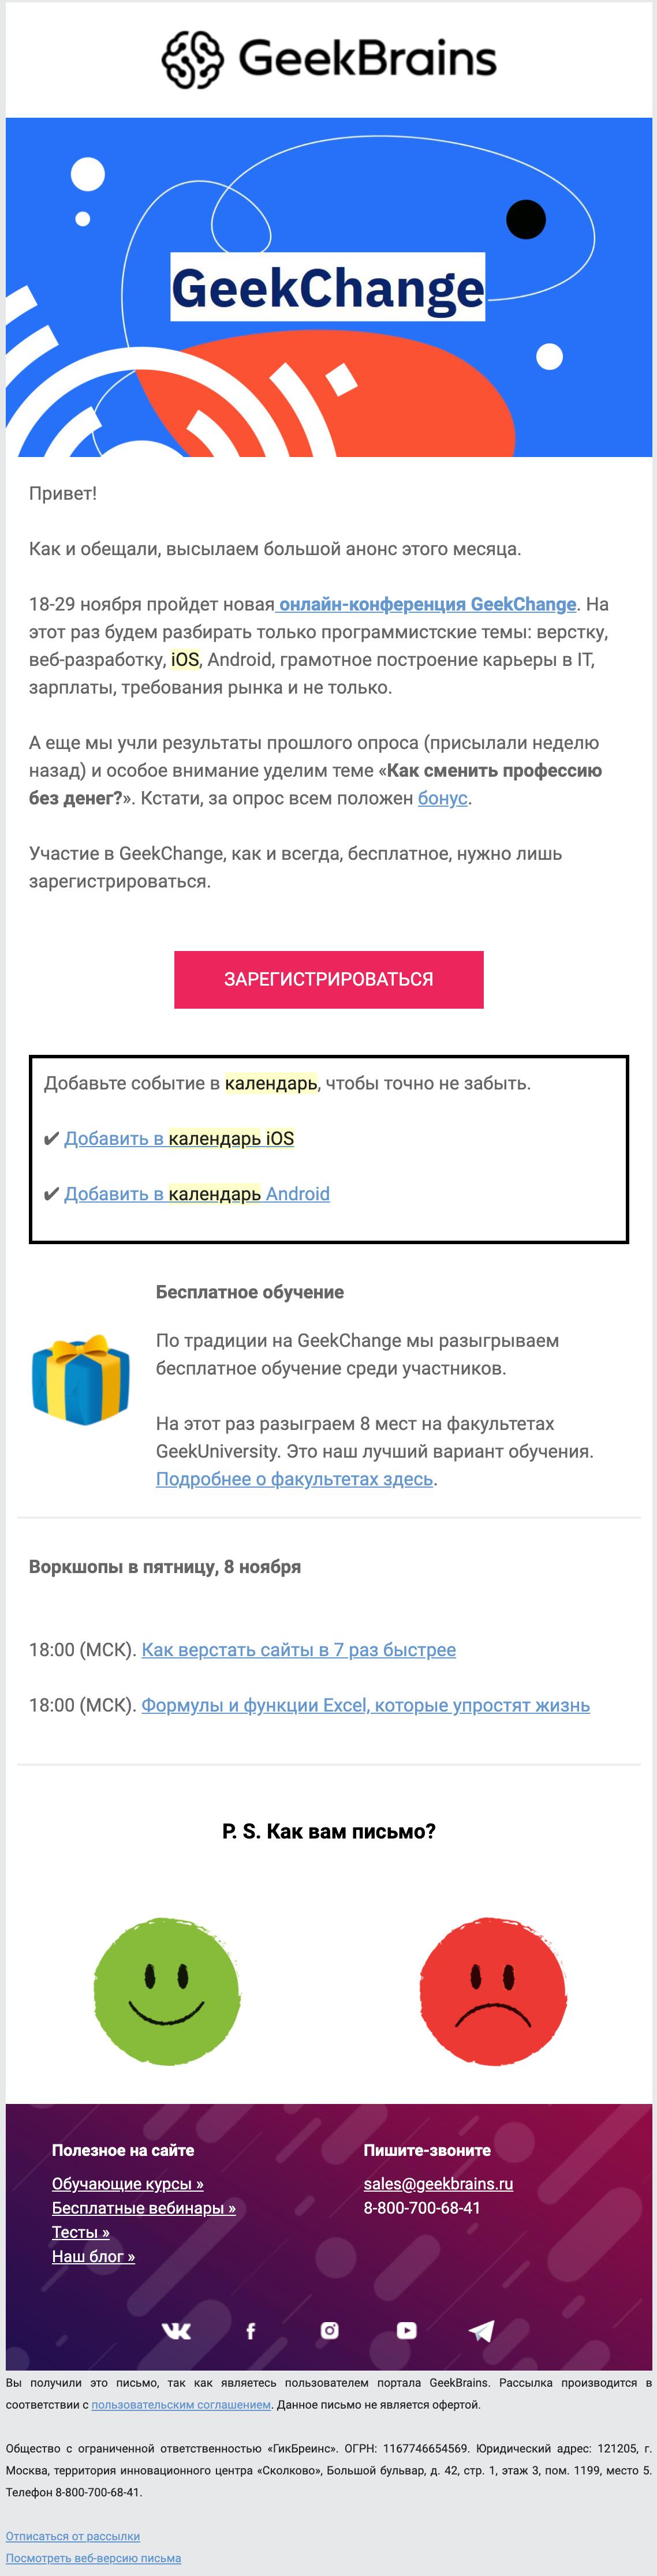 Пример емейл-рассылки GeekBrains